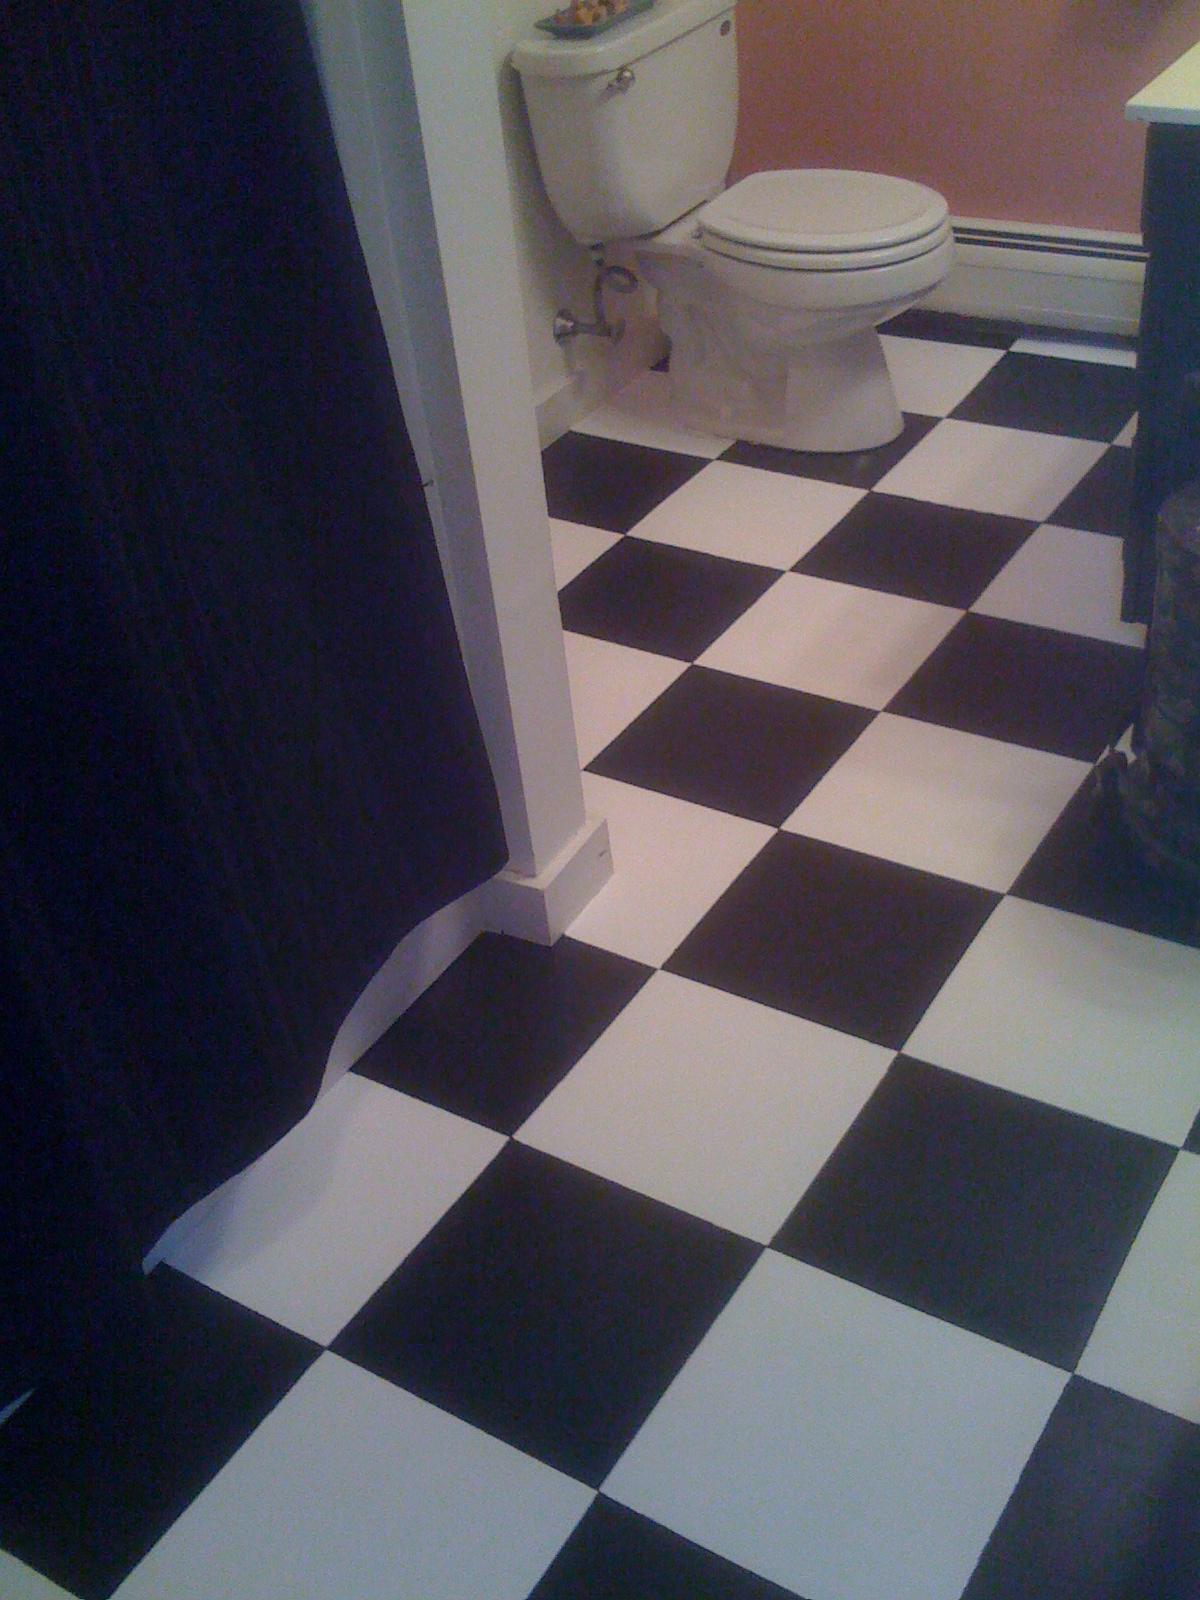 How do i remove vinyl tile flooring answer start by deciding how how do i remove vinyl tile flooring answer start by deciding how much time dailygadgetfo Choice Image